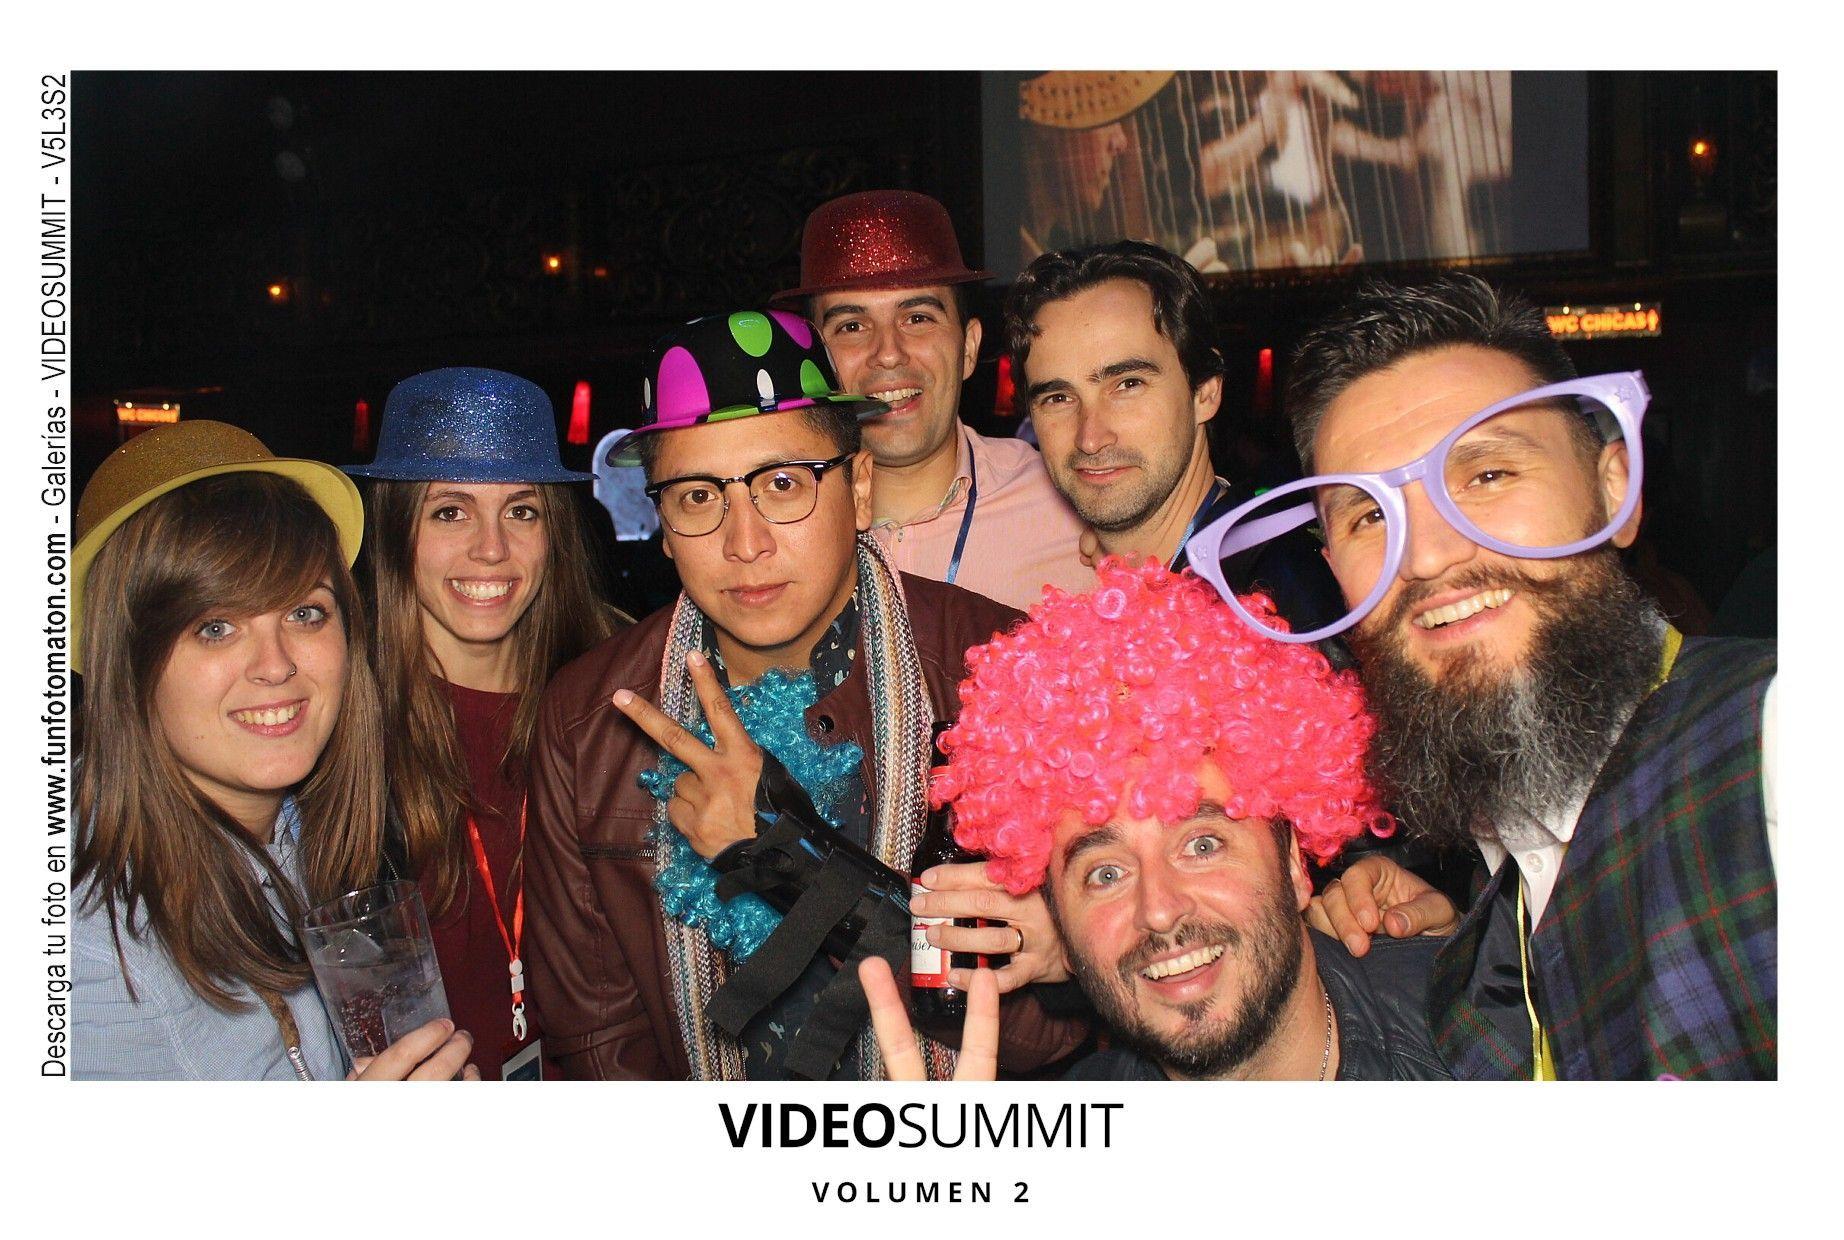 videosummit-vol2-club-party-028